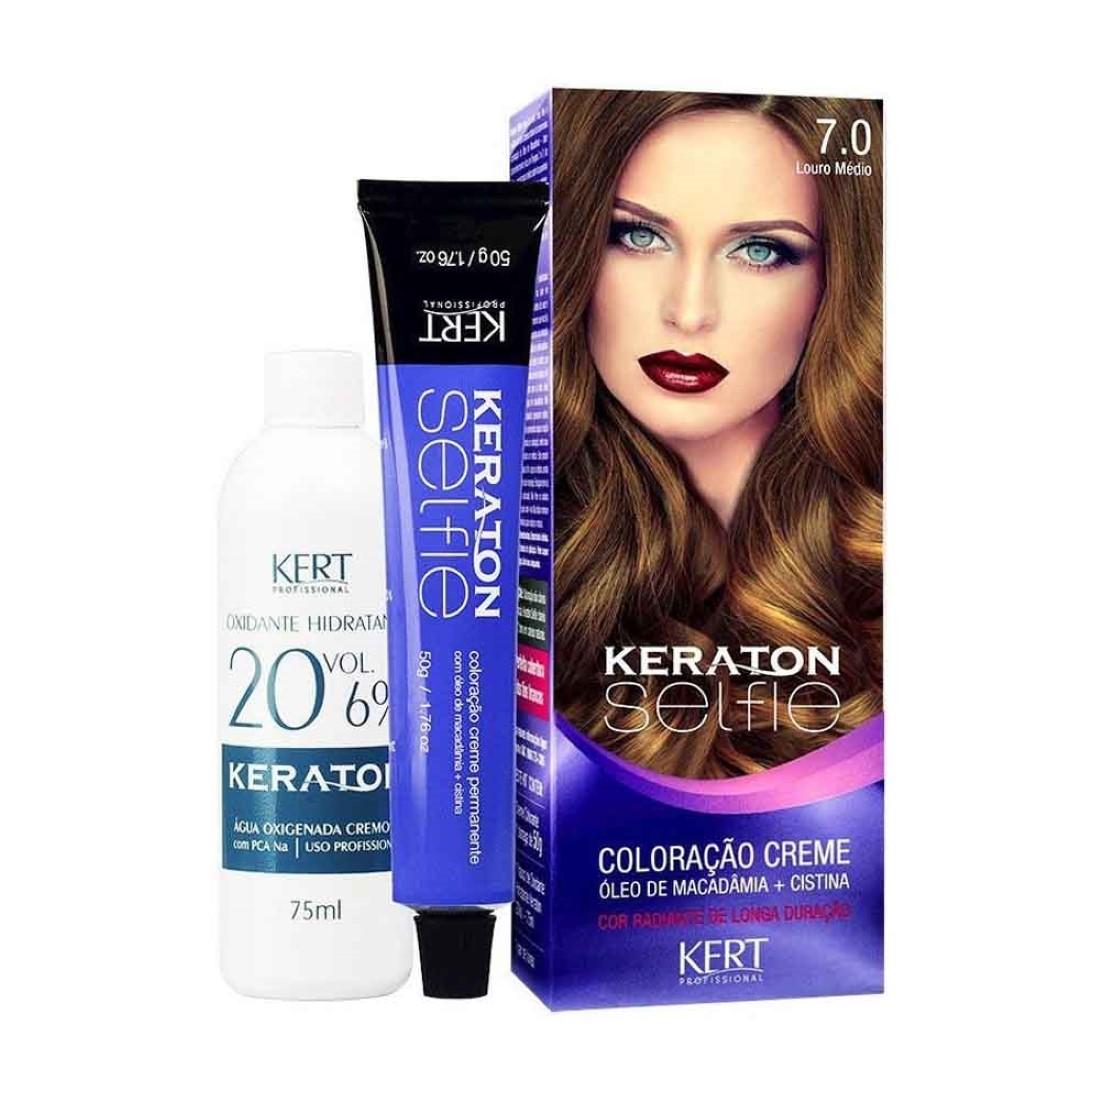 Coloração Keraton Selfie 7.0 Louro Médio - Kert Profissional